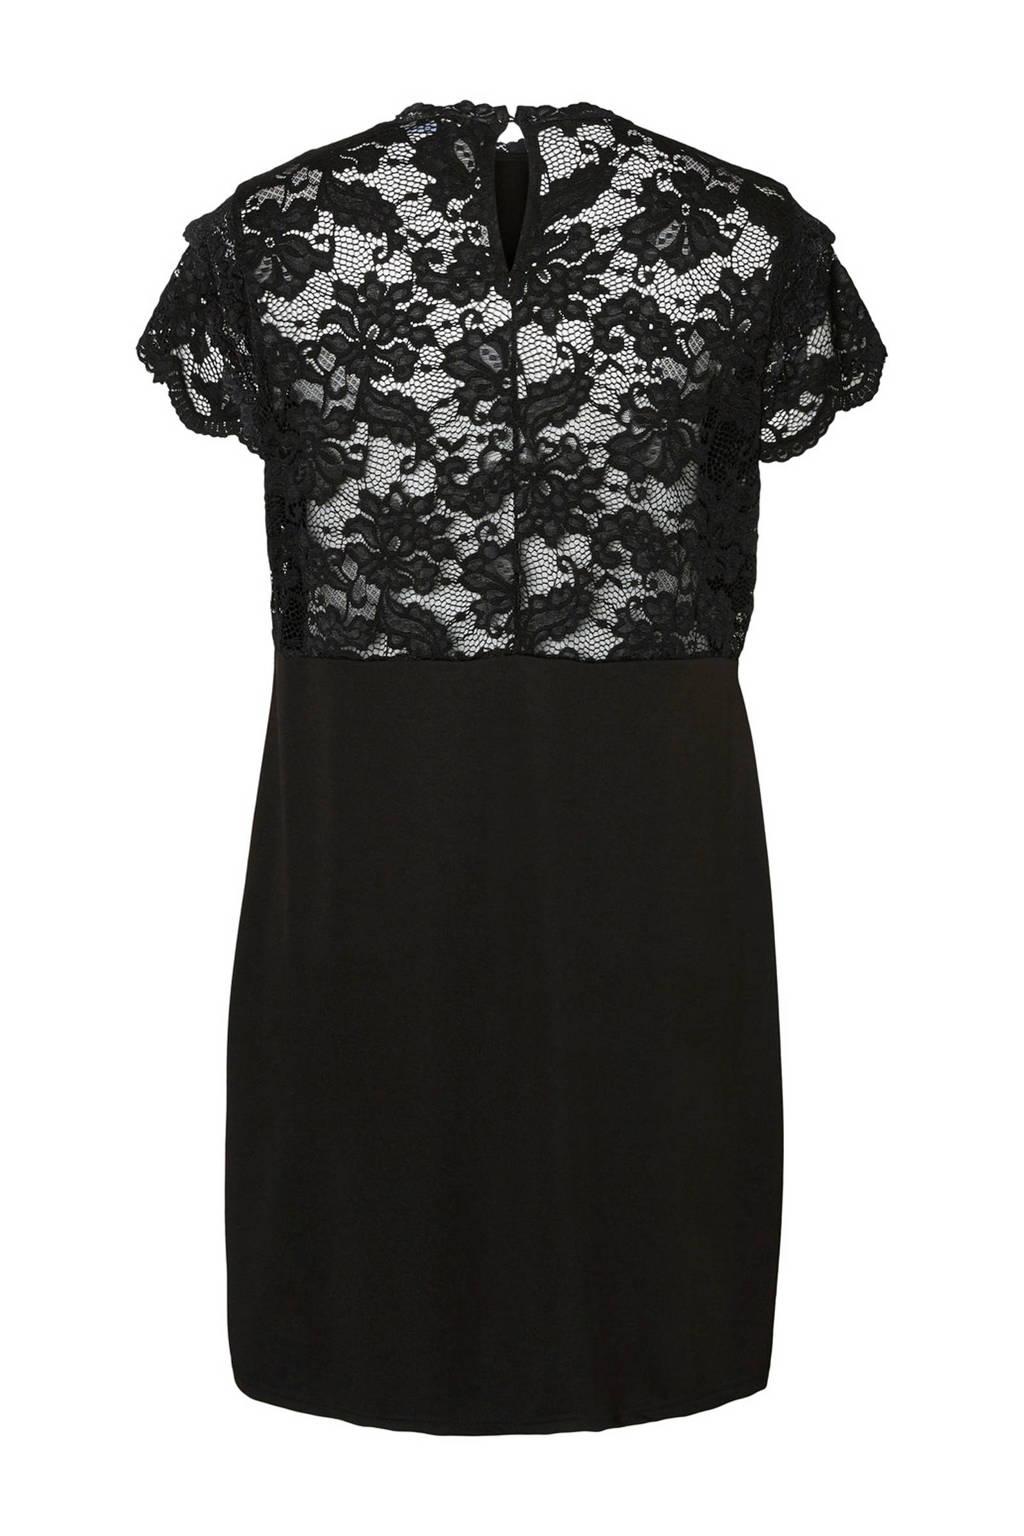 VERO MODA CURVE jurk zwart, Zwart